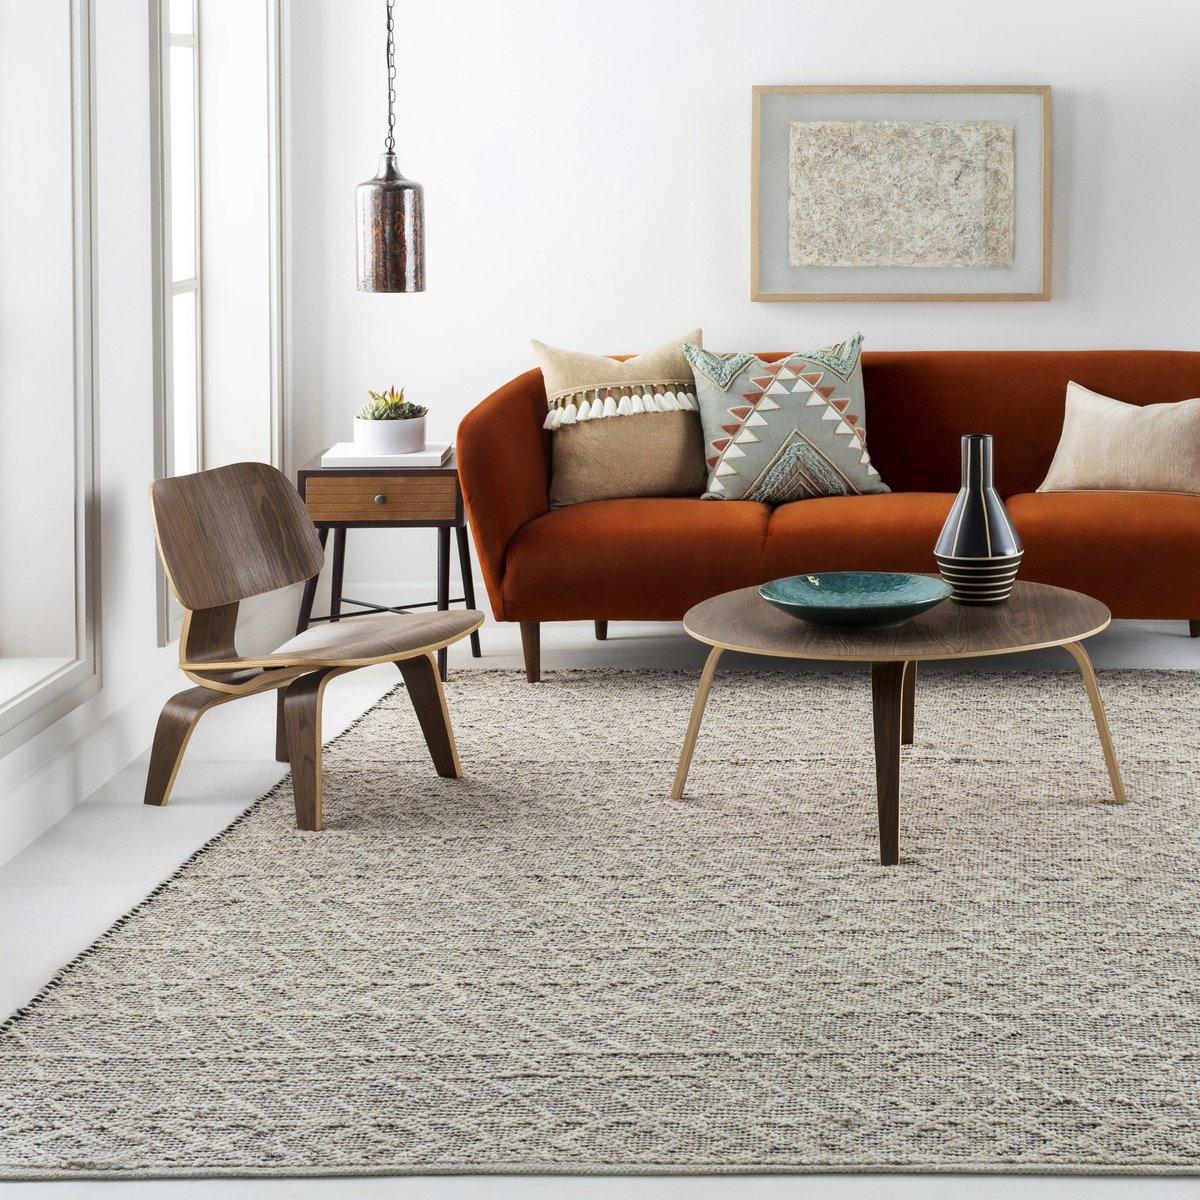 Excellent Accents Living Room Decor Ideas